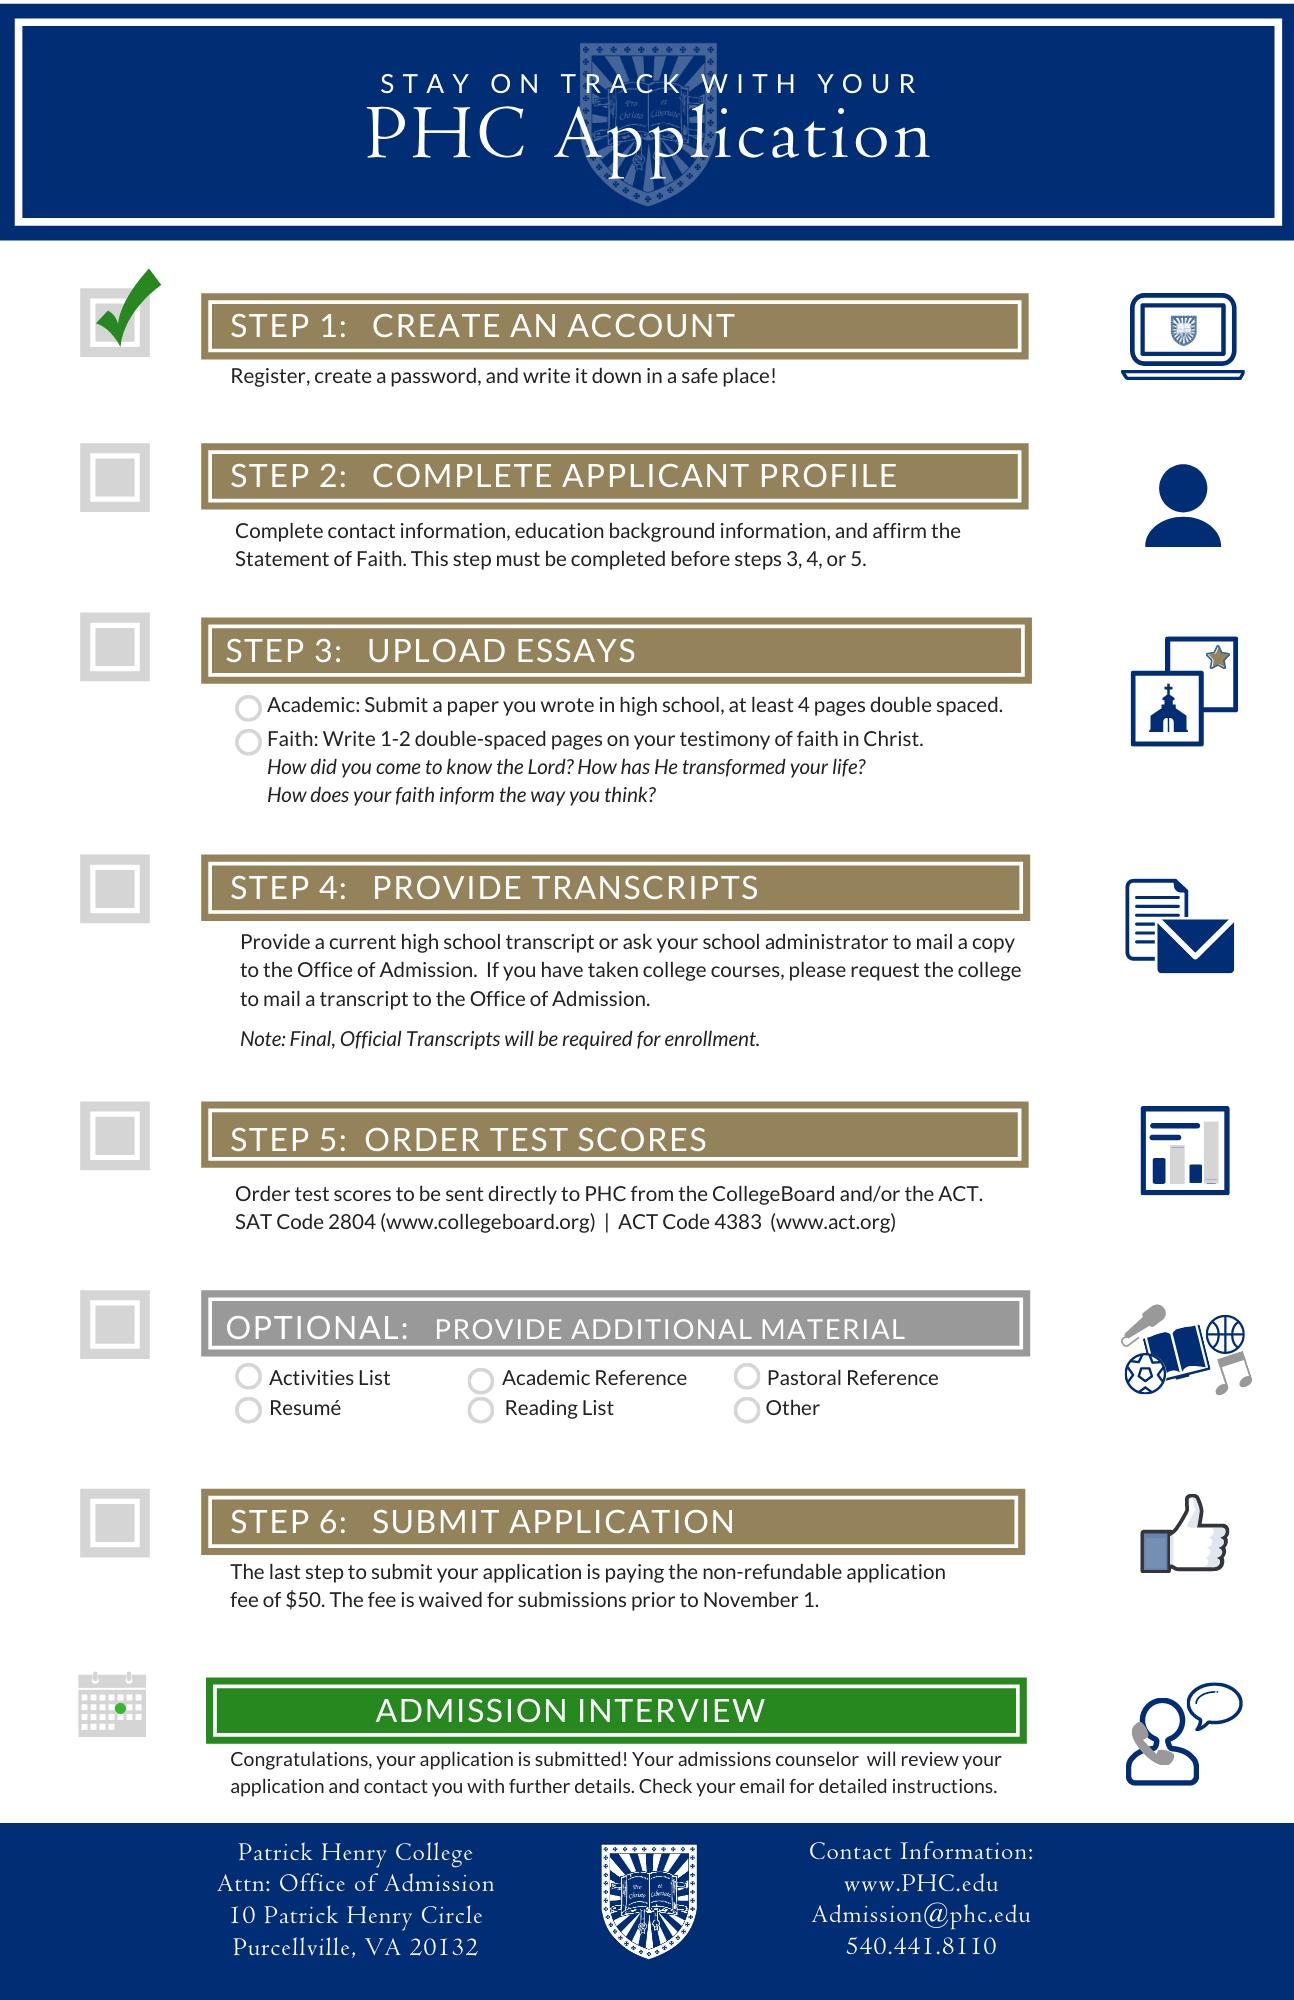 PHC Application Checklist Updated August 2020-1